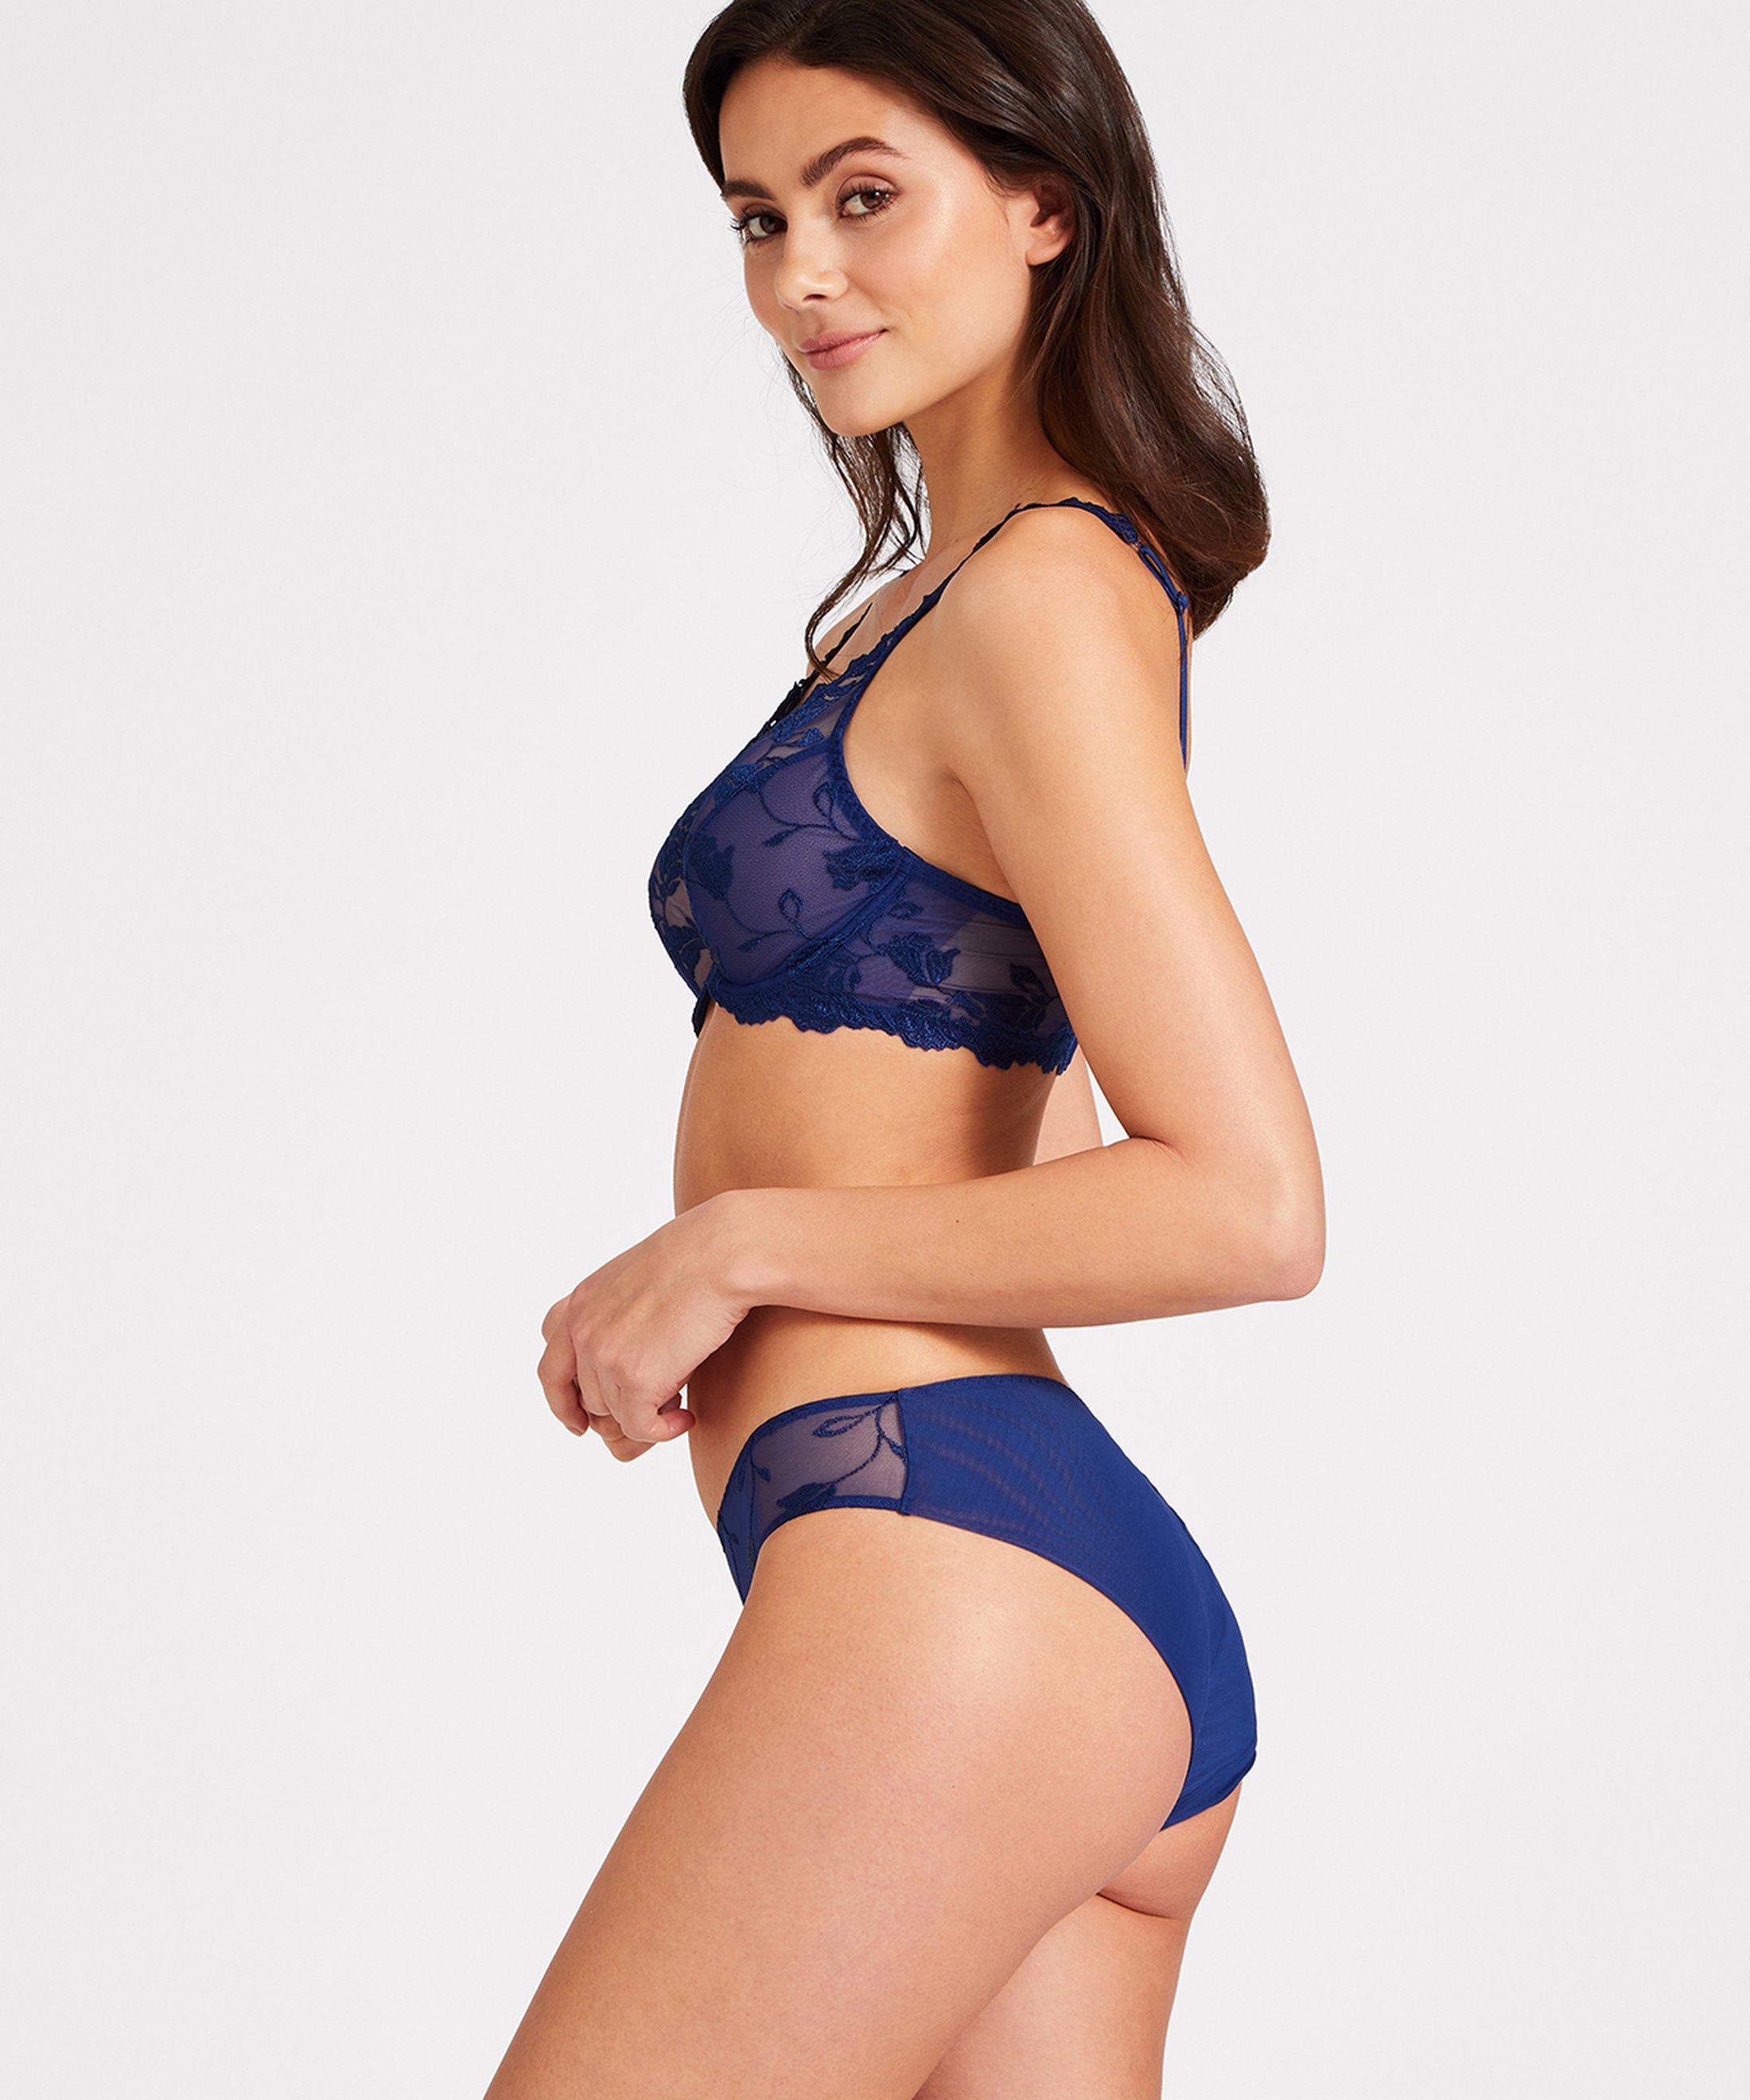 SOFTESSENCE Culotte Brésilienne Bleu Saphir | Aubade